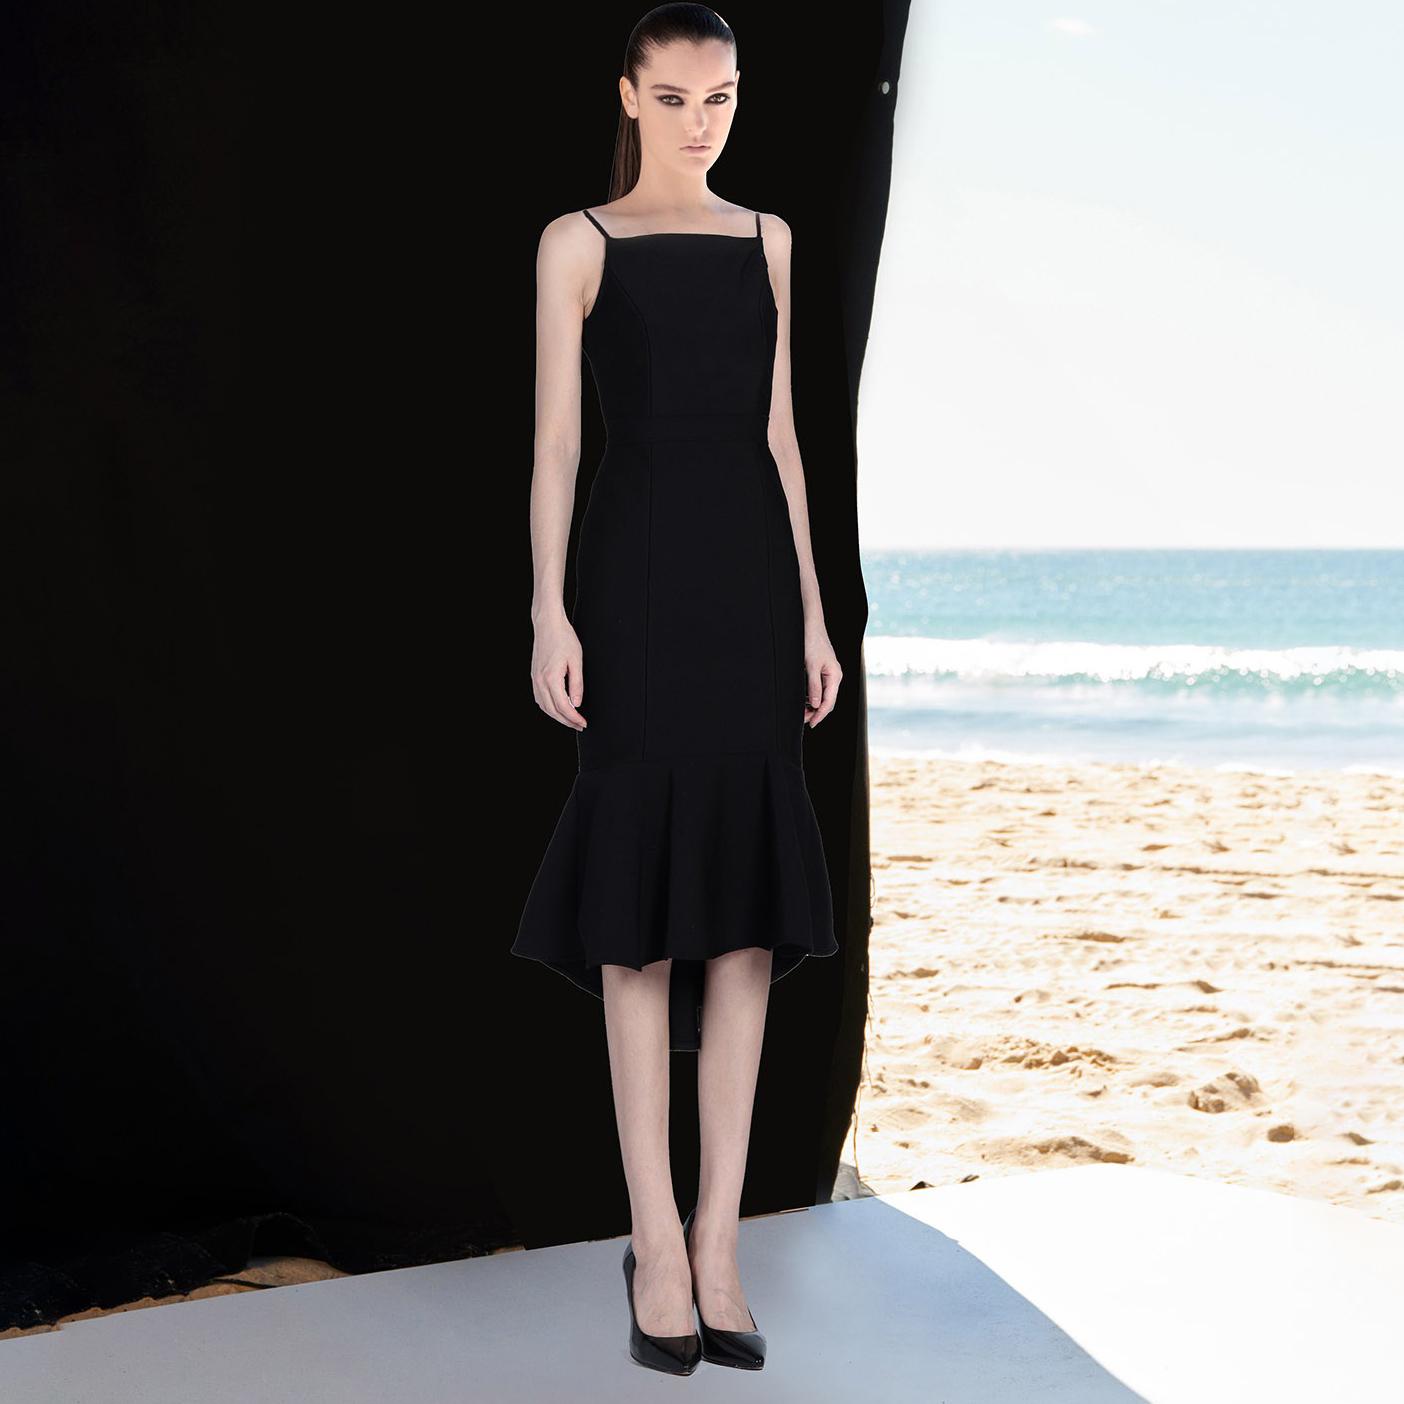 Celebrity Wedding Dresses 2019: 2019 New Mermaid Fishtail Spaghetti Strap Bandage Dress